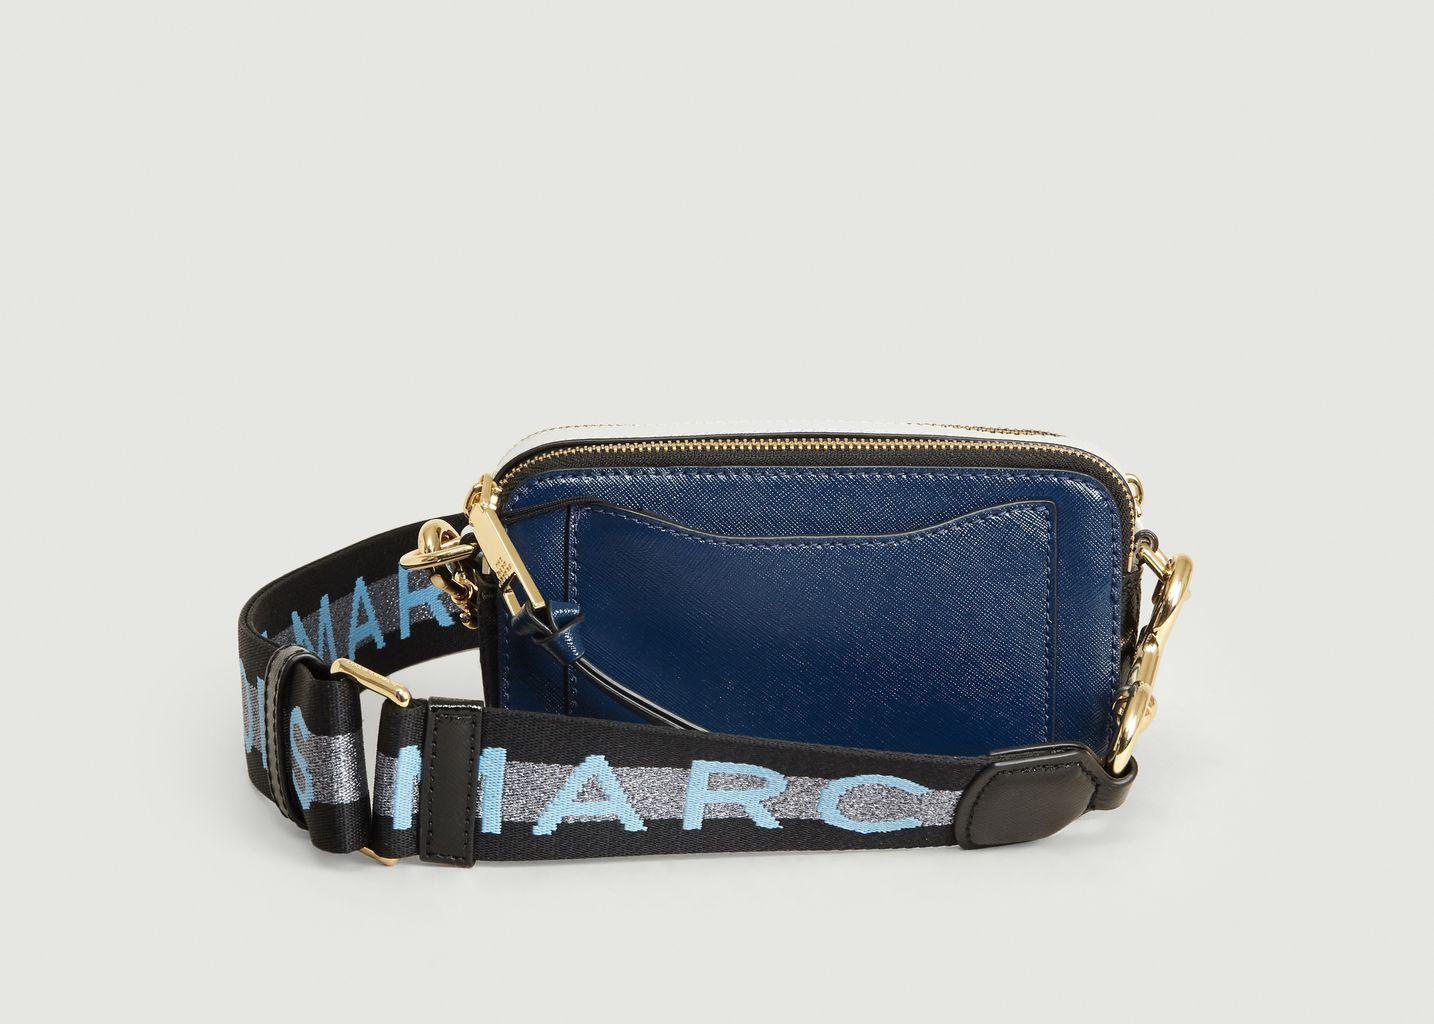 Sac The Logo Strap Snapshot Small Camera Bag - The Marc Jacobs